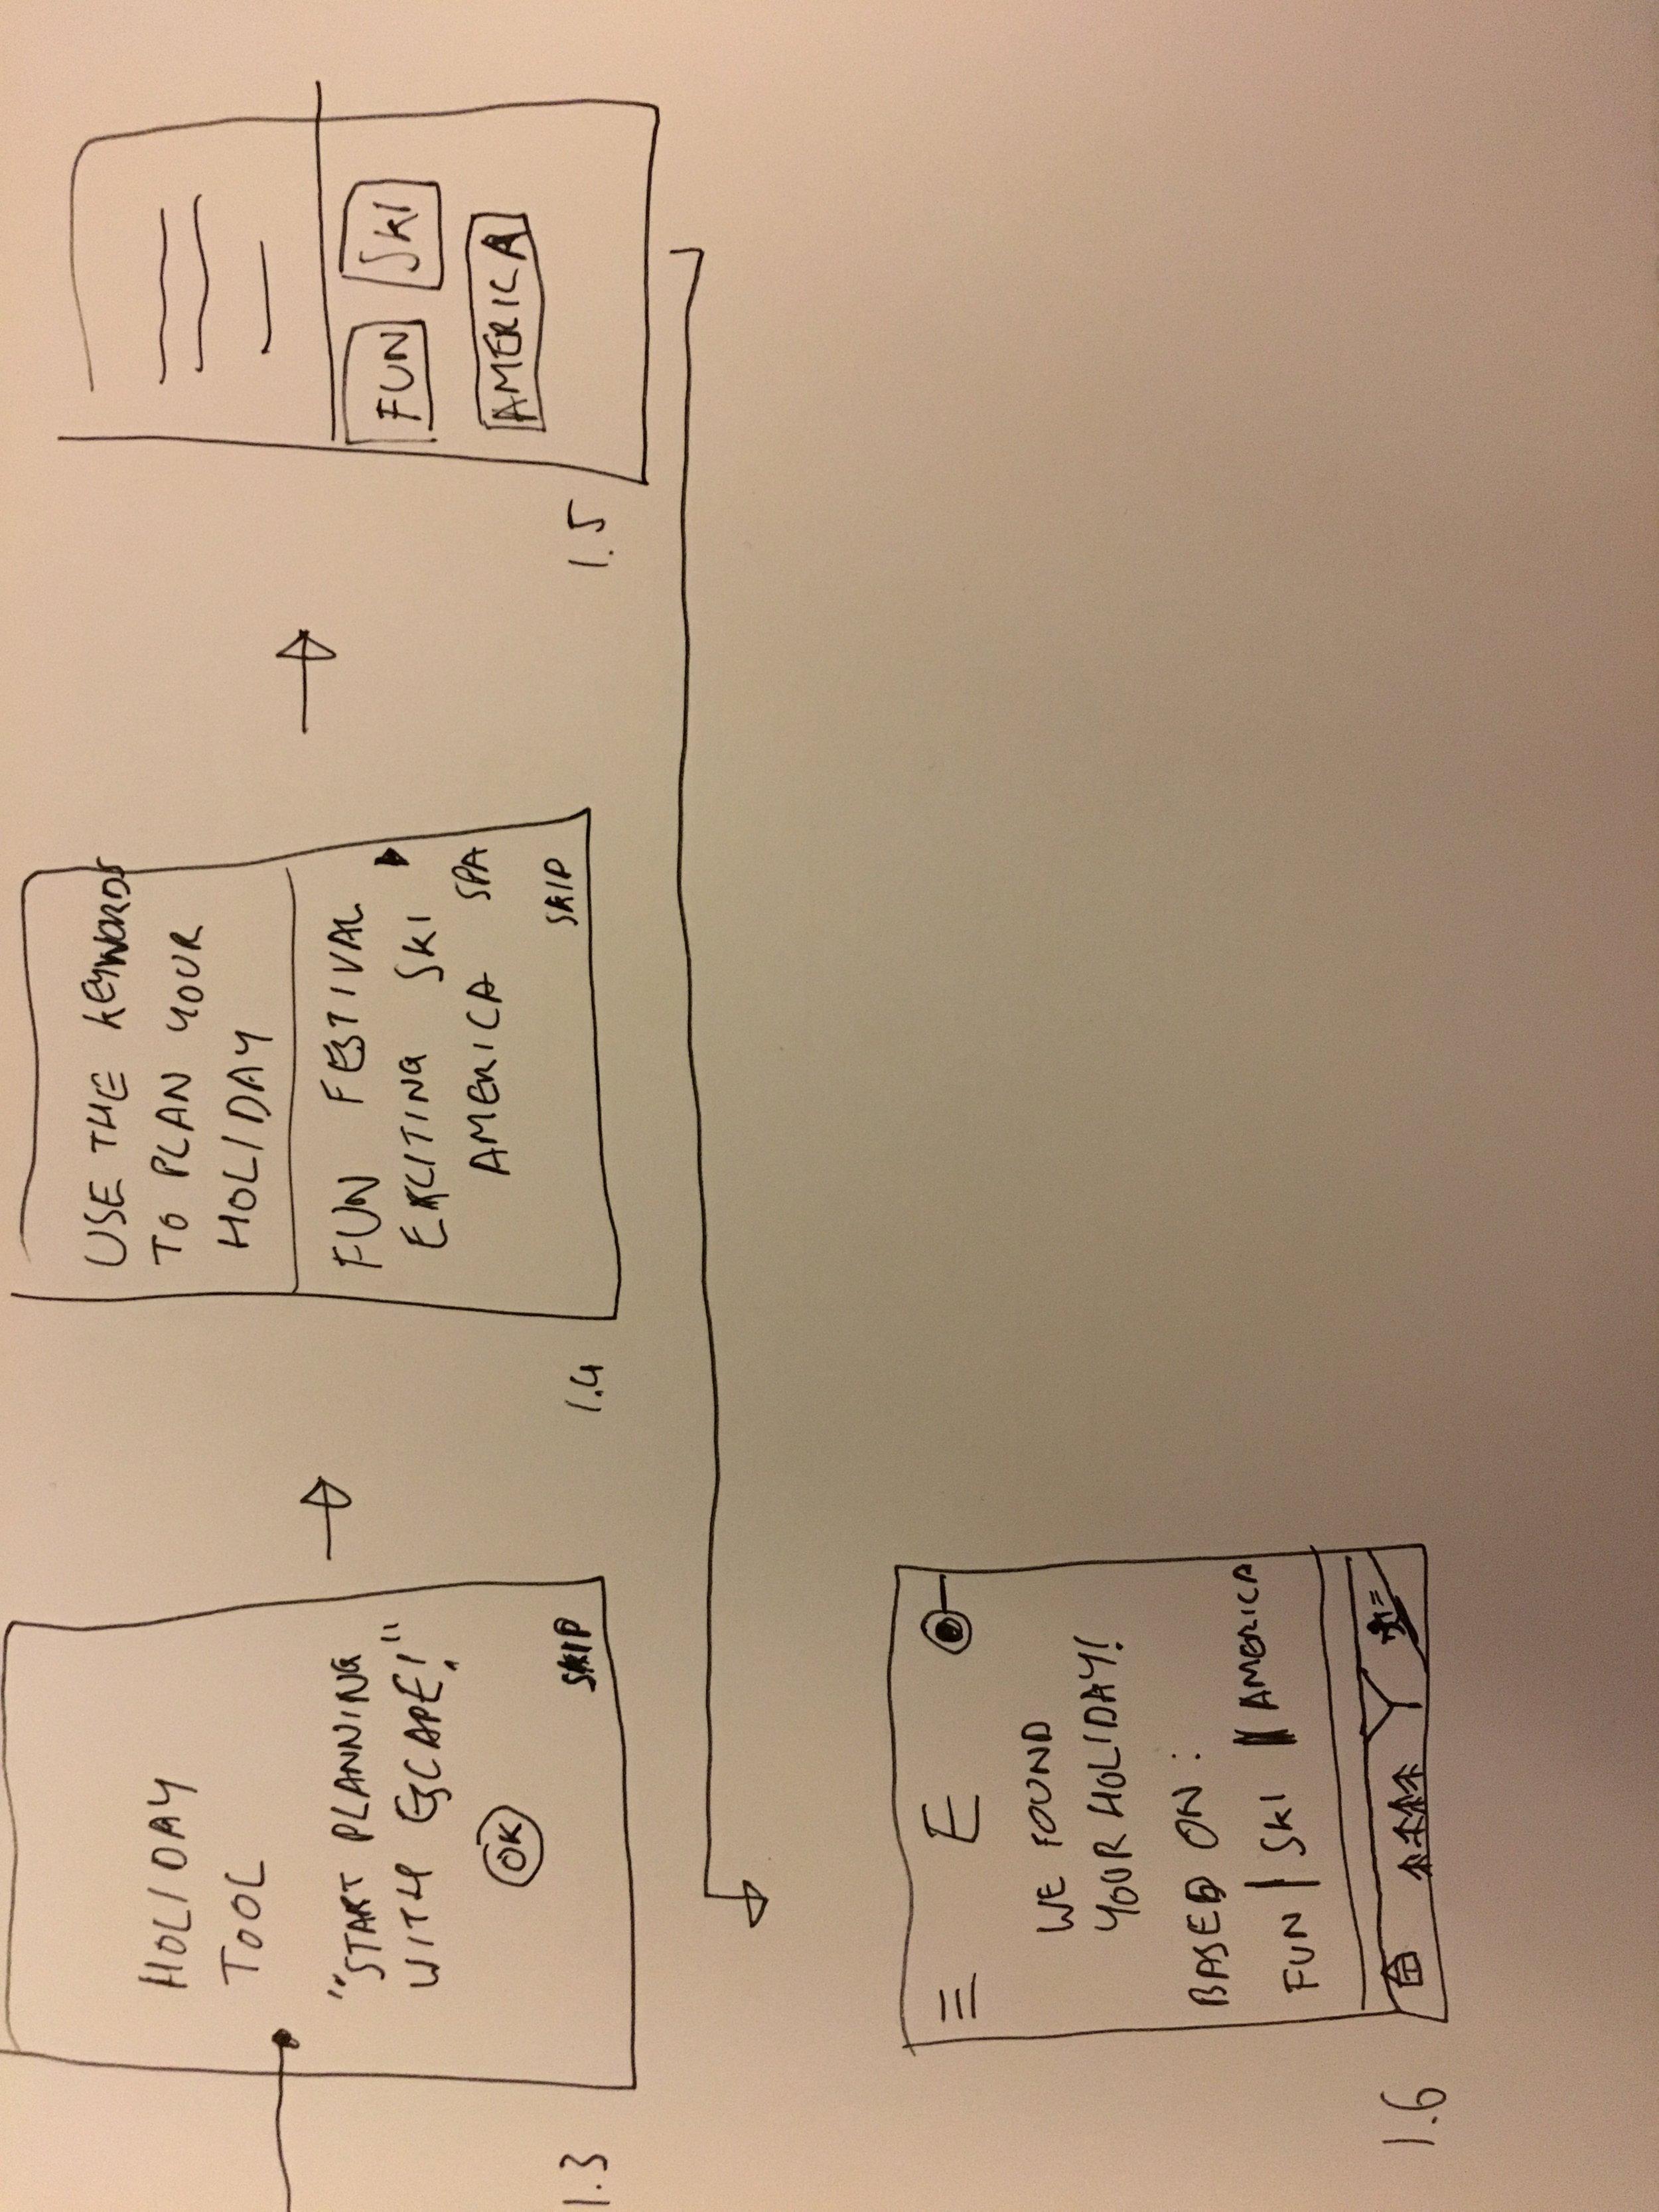 ESCAPE_Sketches p2.JPG